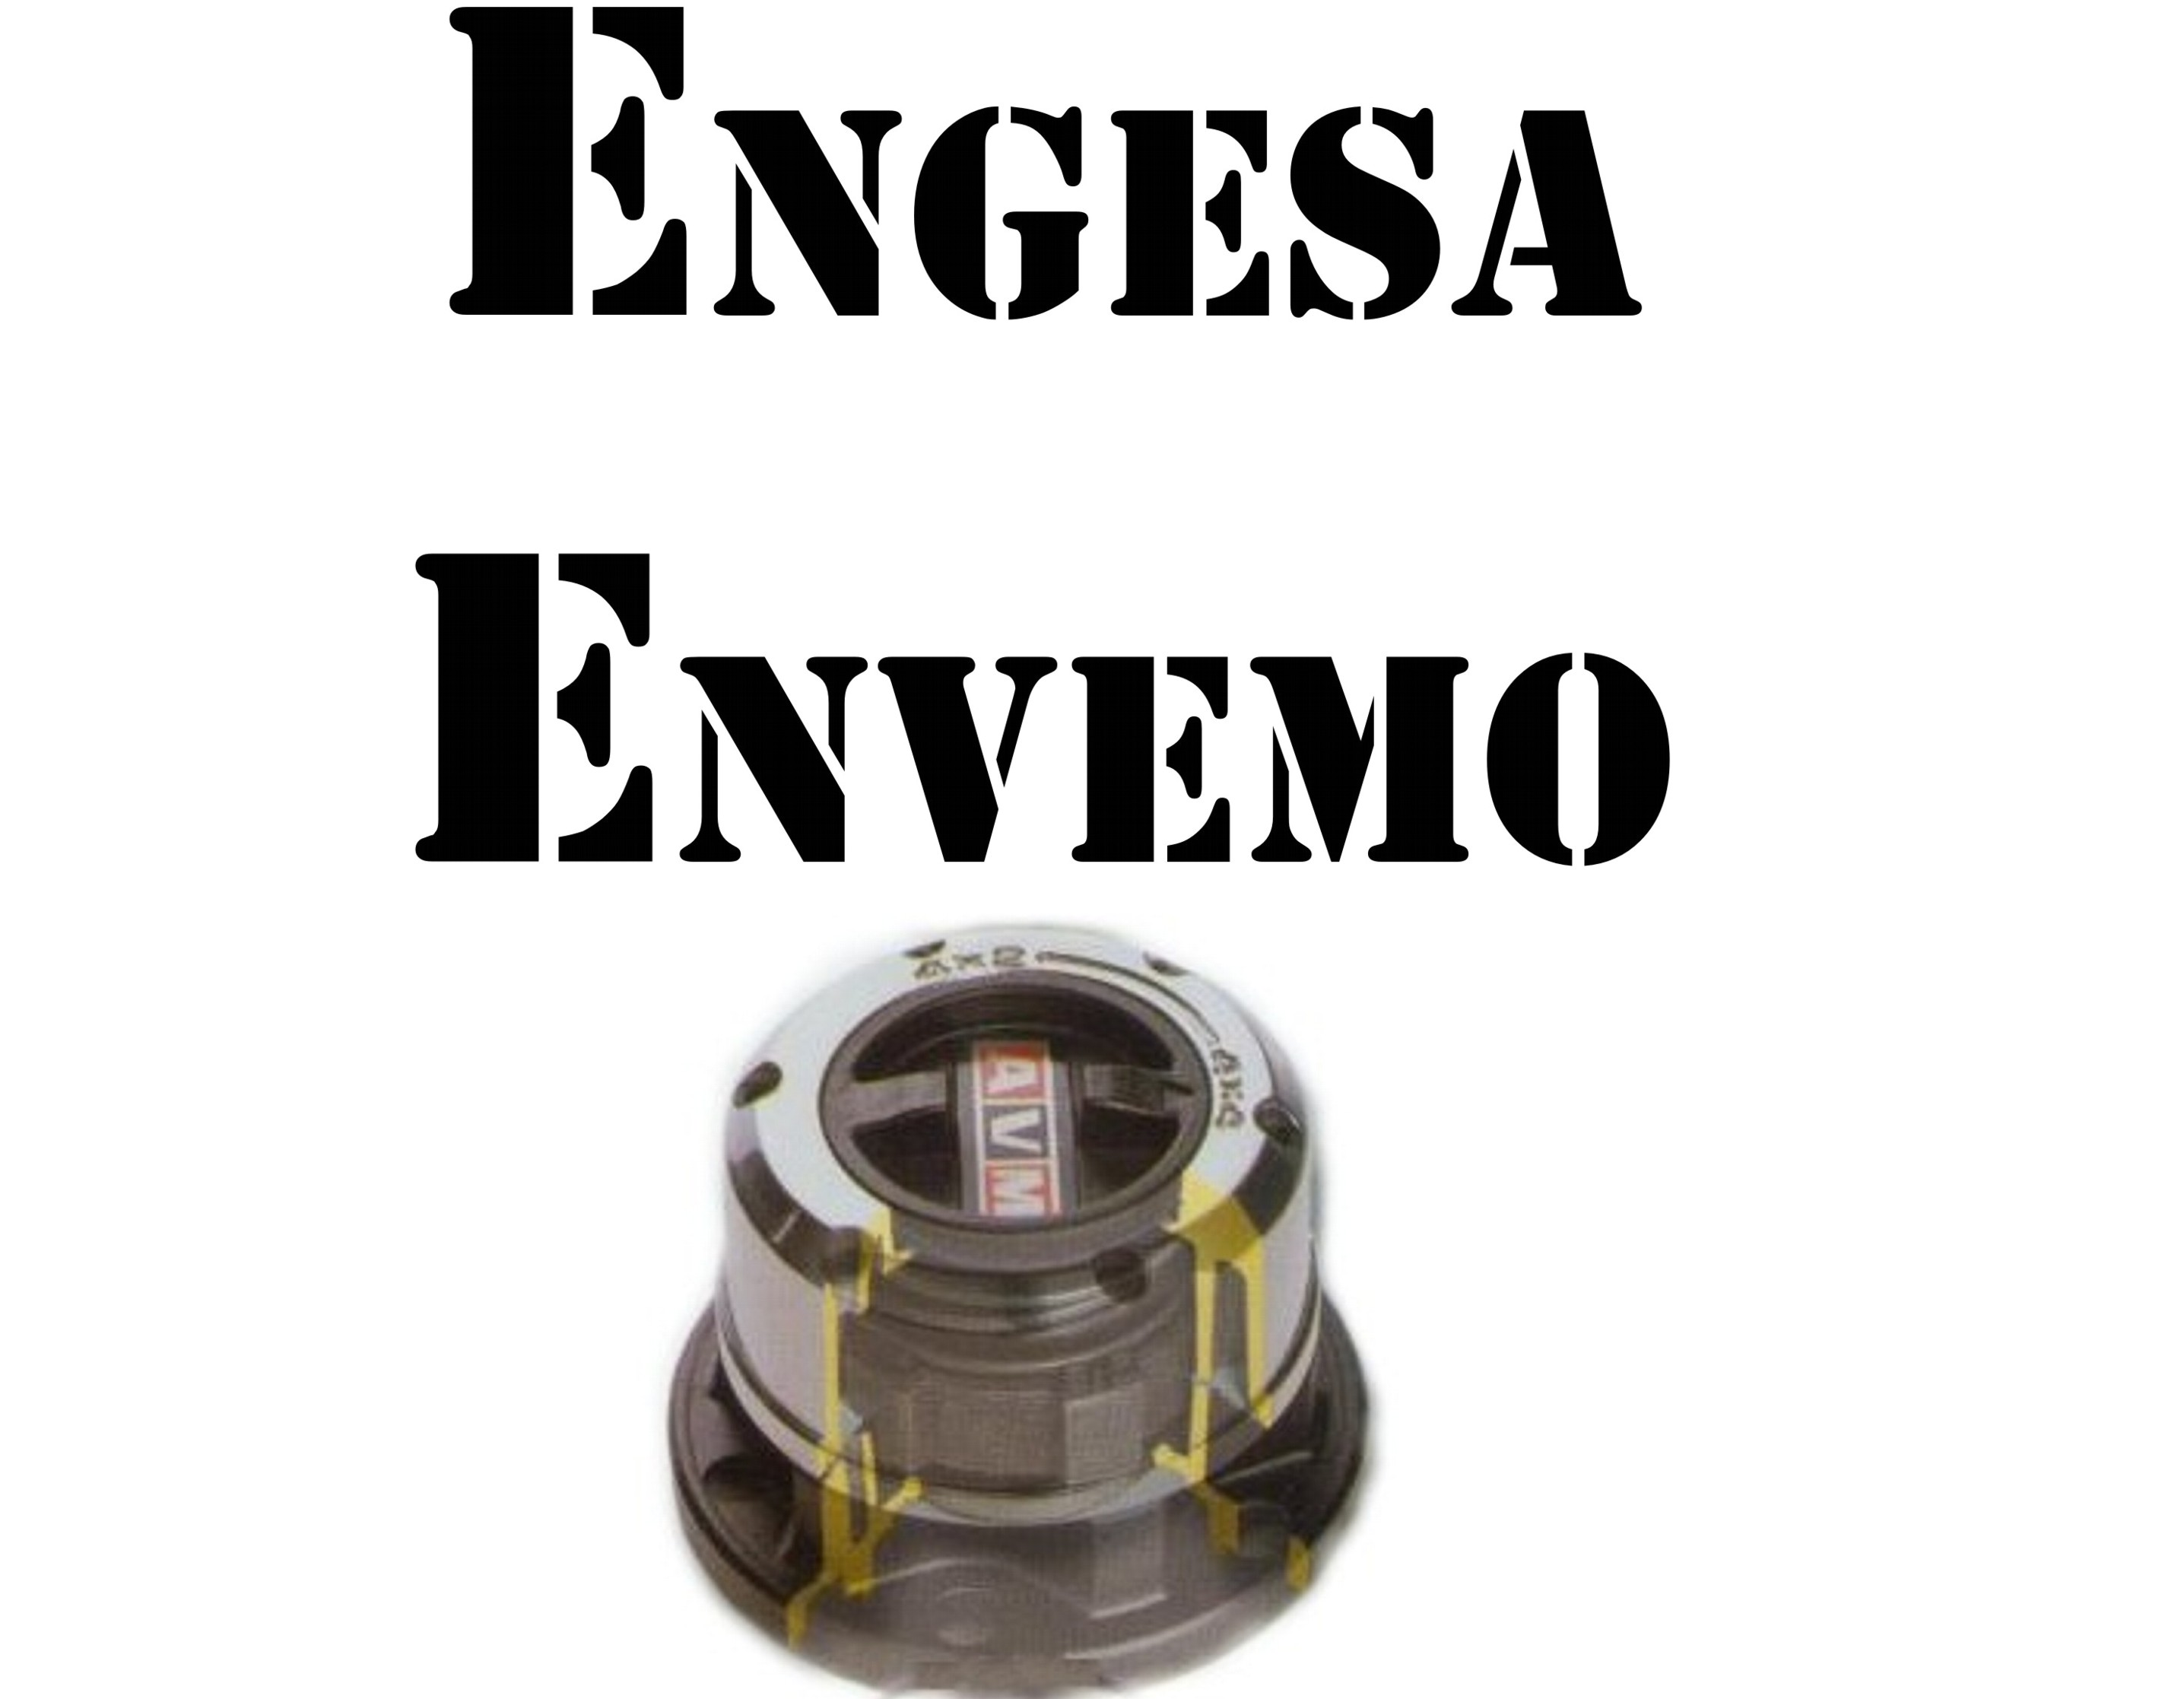 ENGESA / ENVEMO